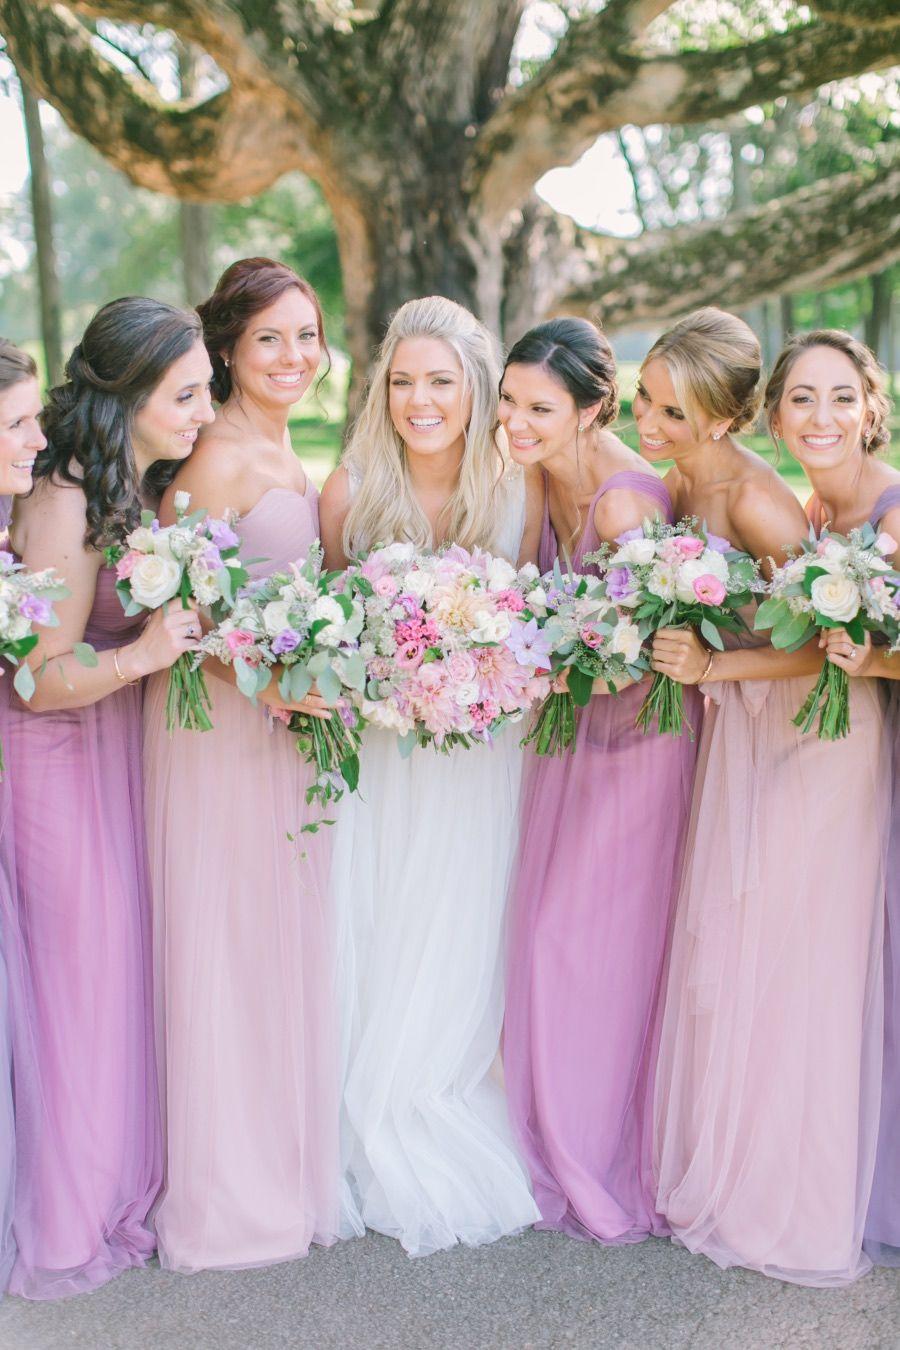 Breathtaking Pink And Lavender Summer Wedding From Love Light Photographs Modwedding Pink Purple Wedding Wedding Bridesmaid Dresses Summer Bridesmaid Dresses [ 1350 x 900 Pixel ]